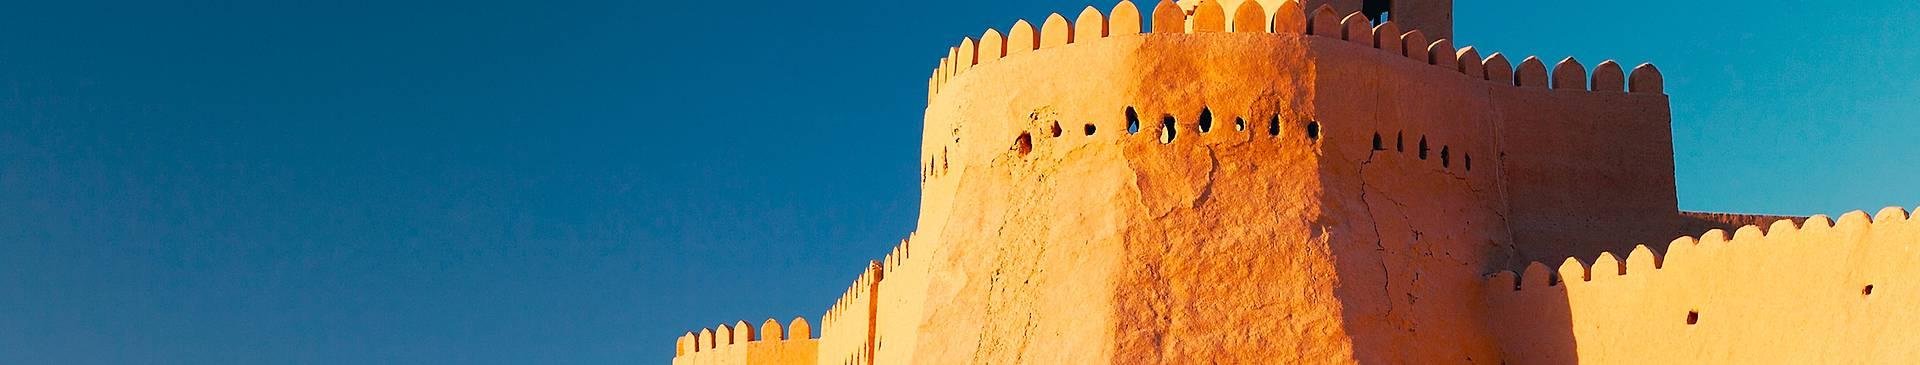 Historical sites in Uzbekistan